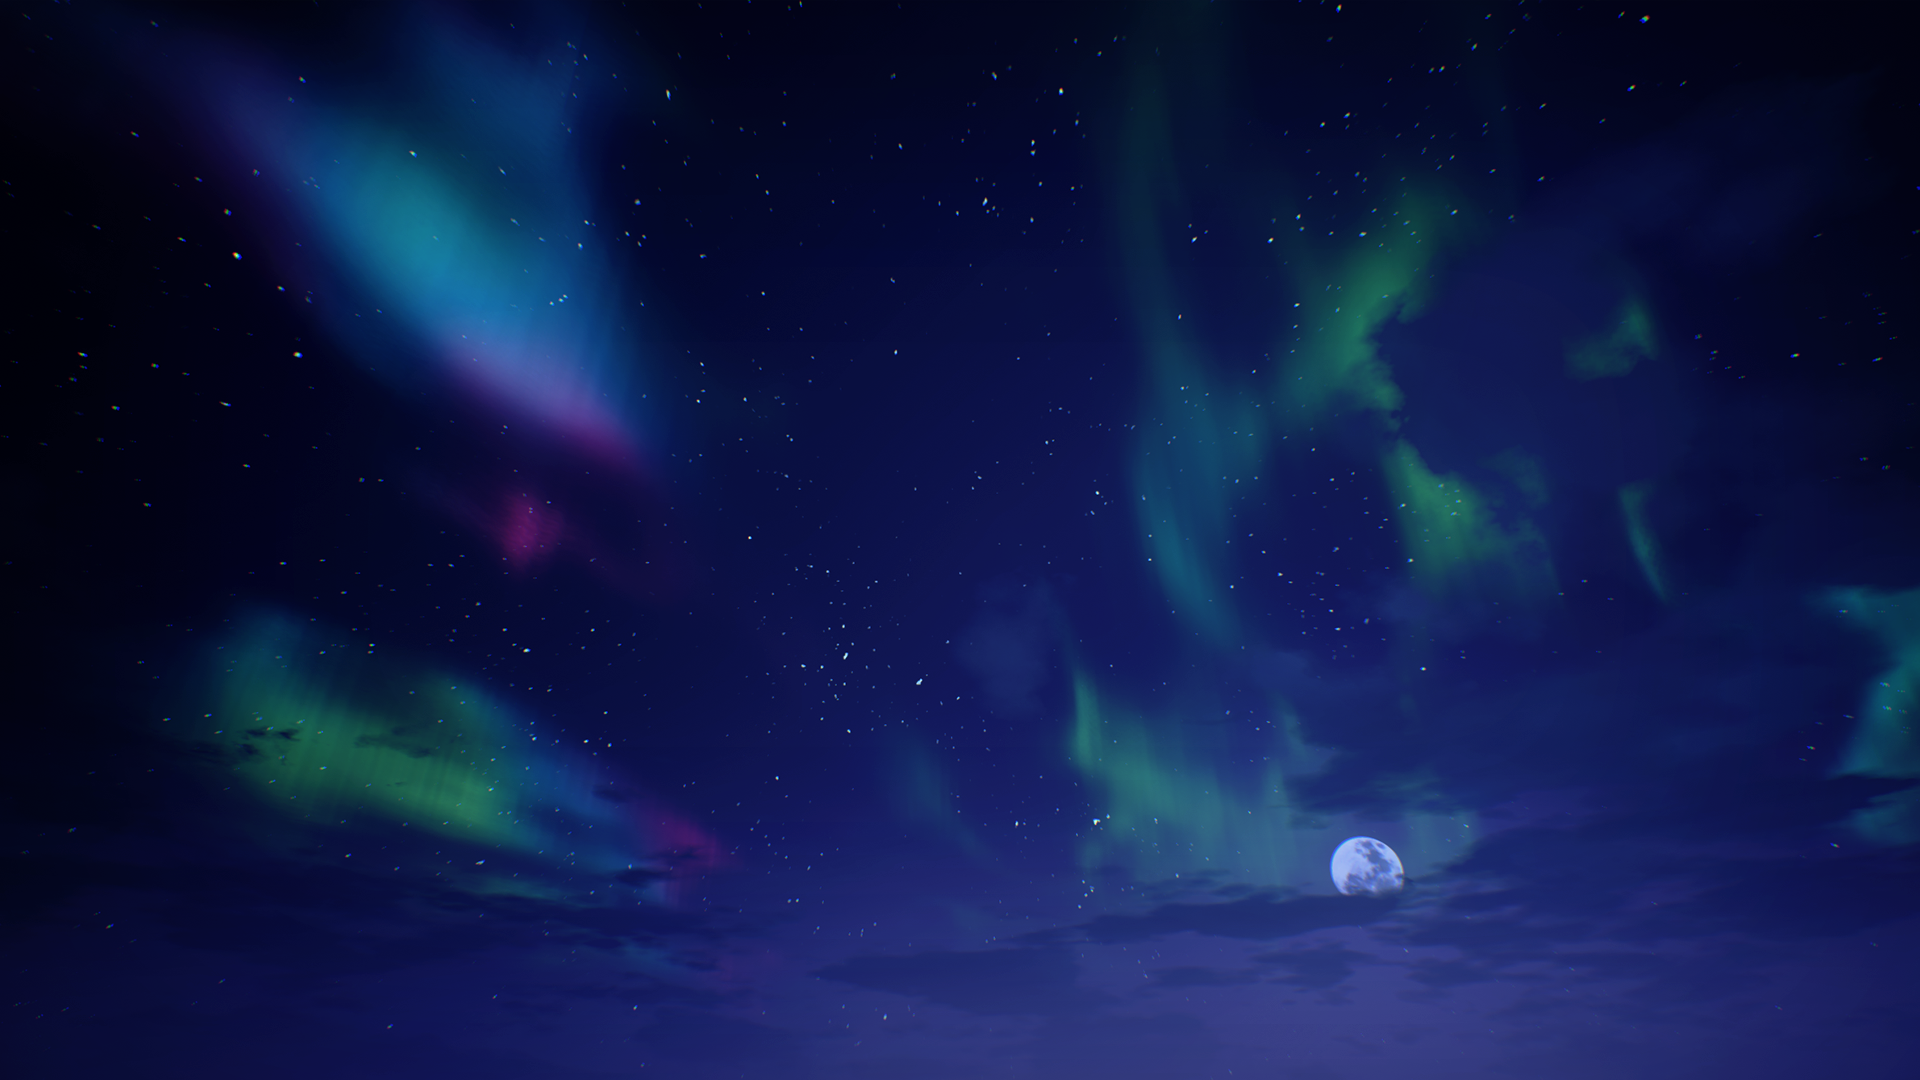 ue4 how to make dynamic sky